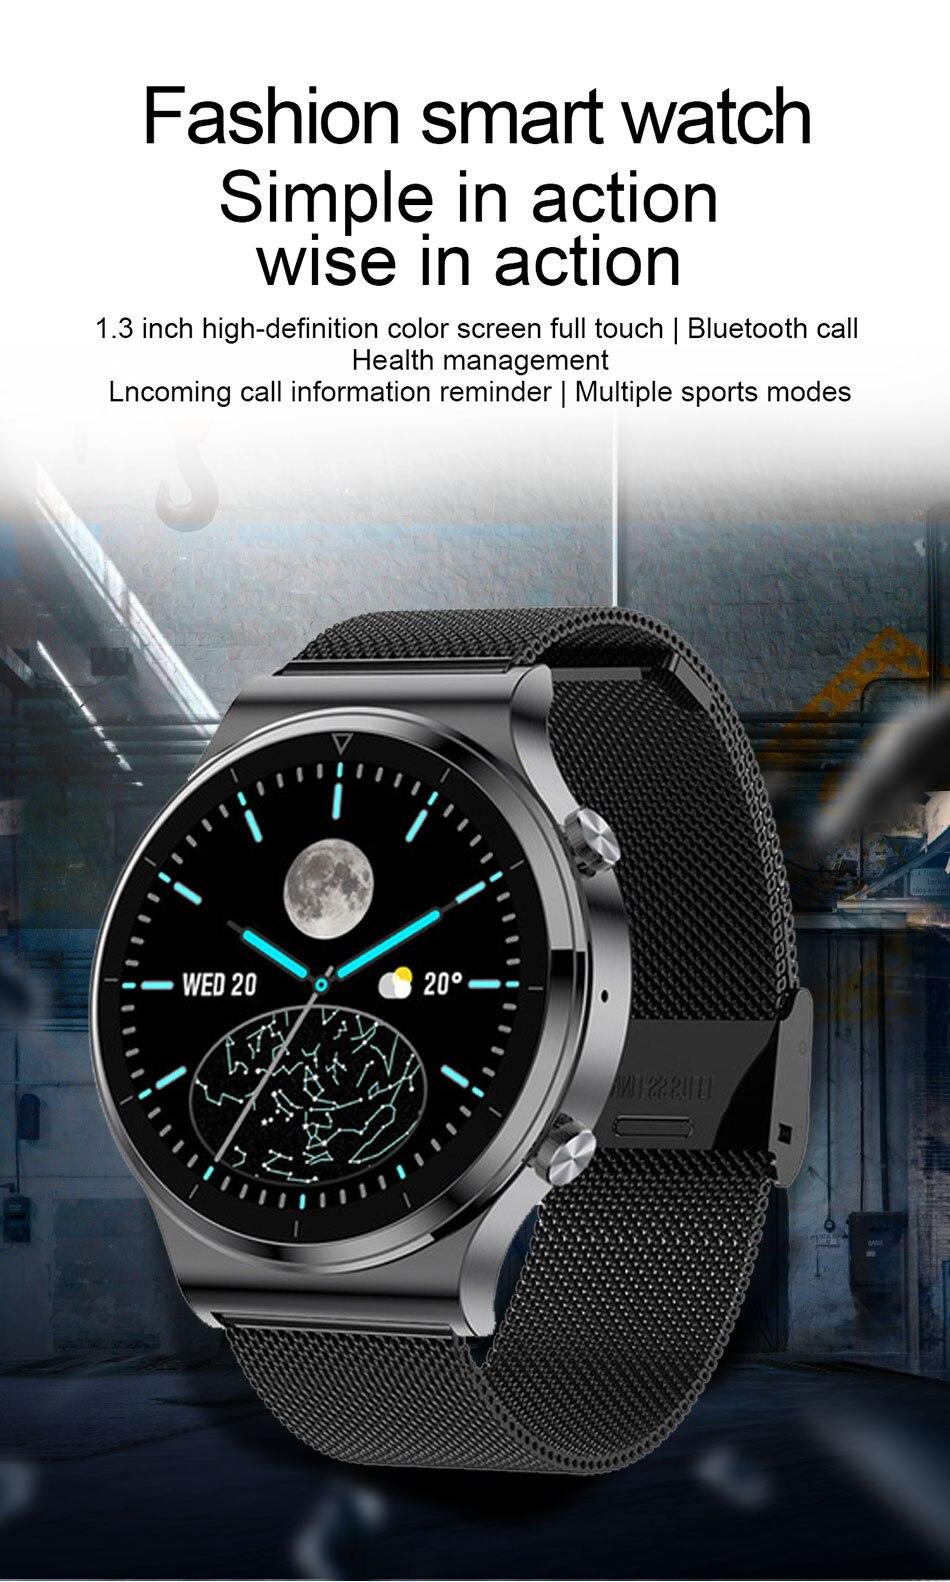 H9d999941ffb4449ea92bcfe9128b51170 LIGE 2021 New Smart watch Men IP68 waterproof watch Multiple sports modes heart rate weather Forecast Bluetooth Men Smart watch